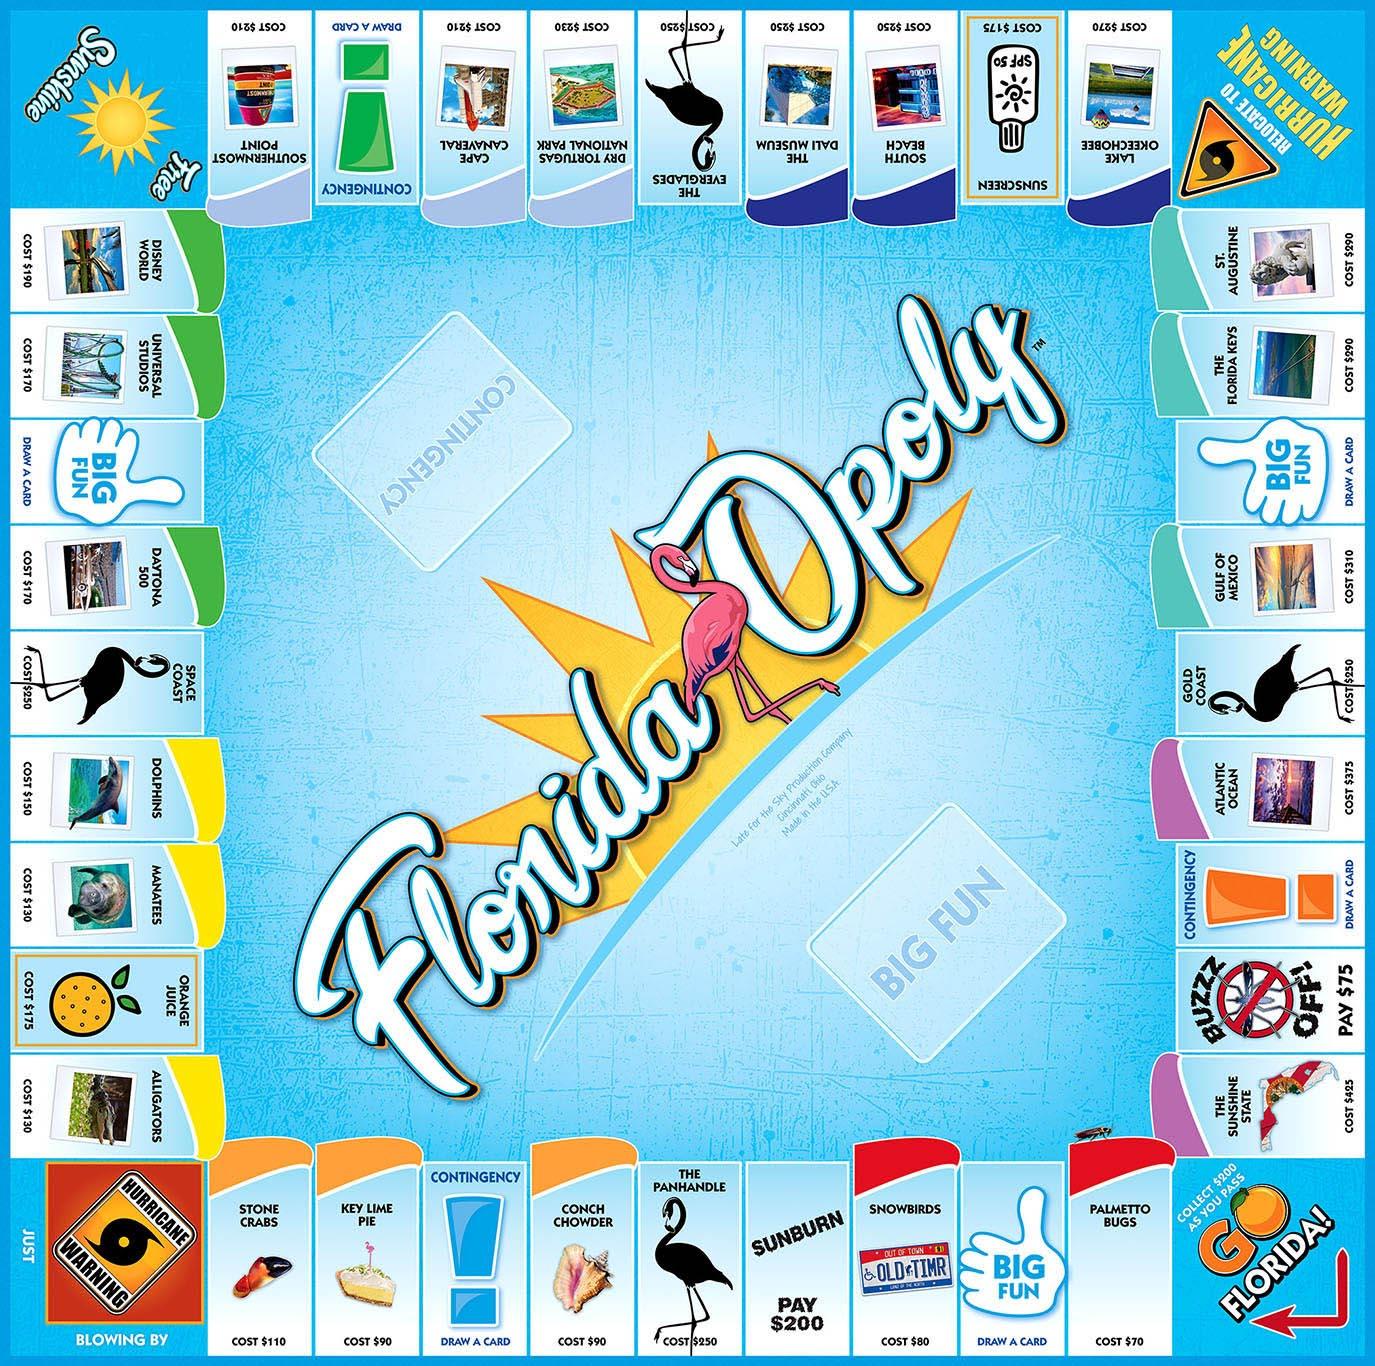 FLORIDA-OPOLY Board Game